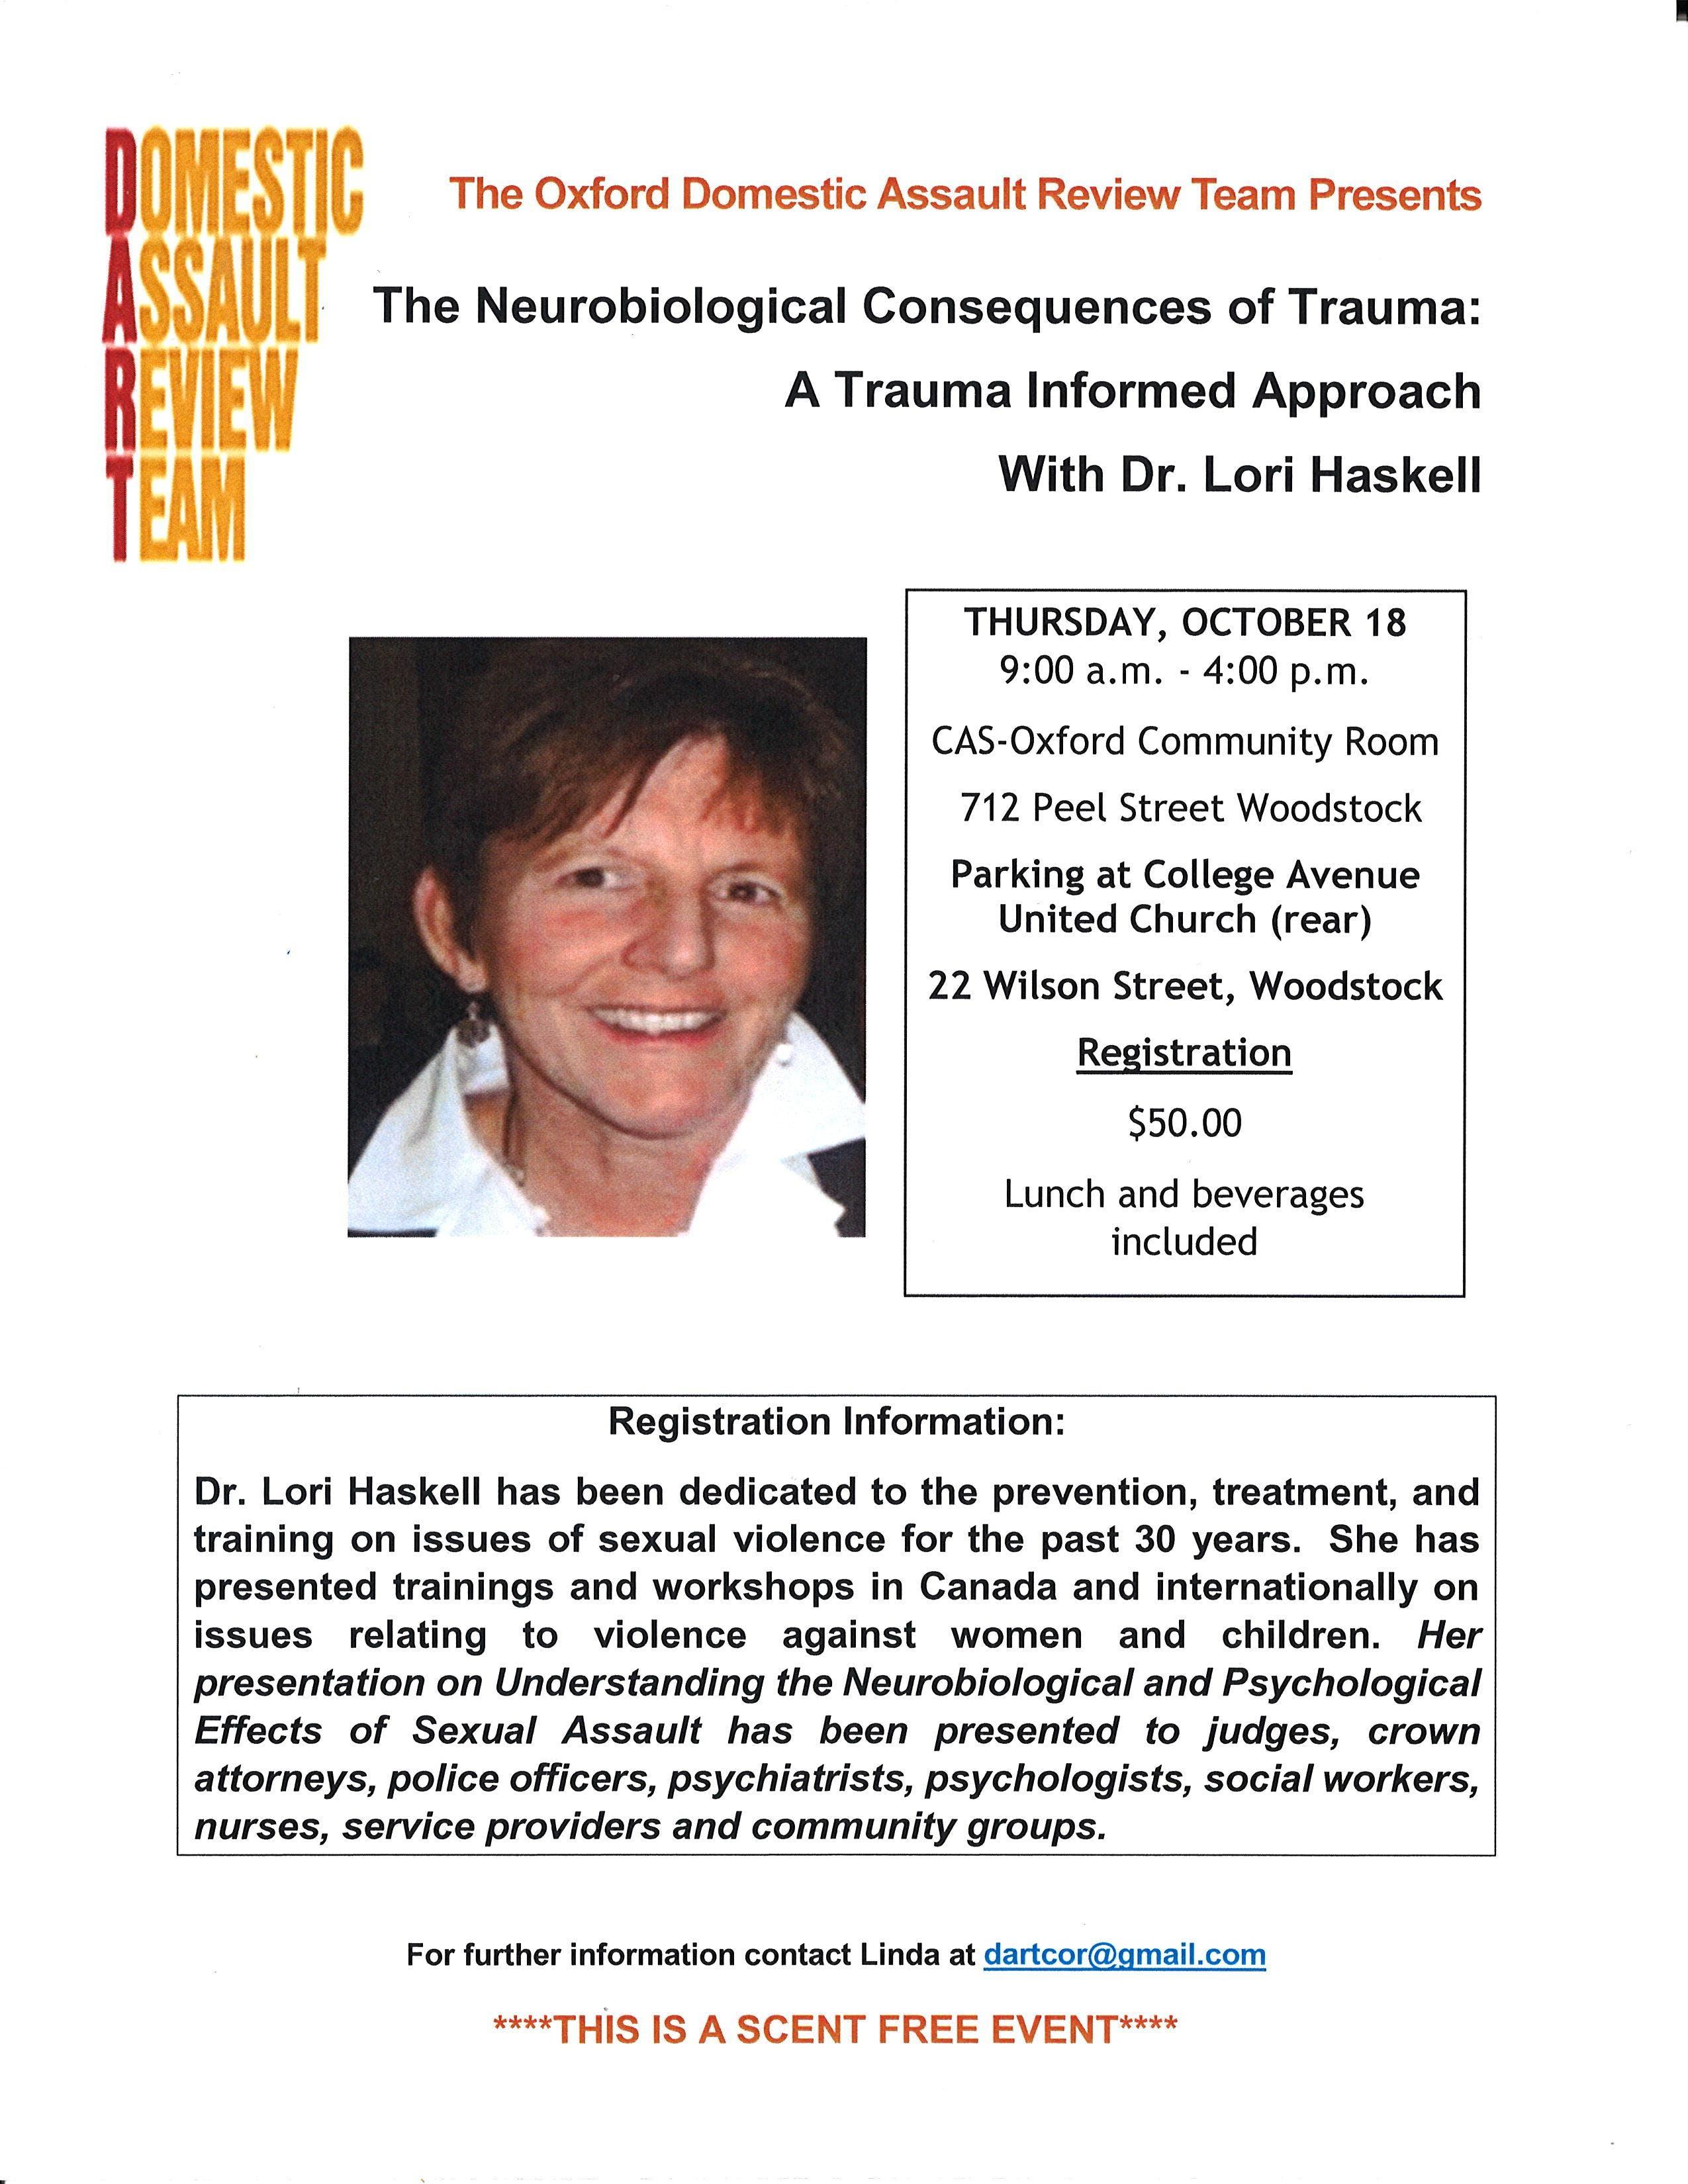 The Neurobiological Consequences of Trauma: A